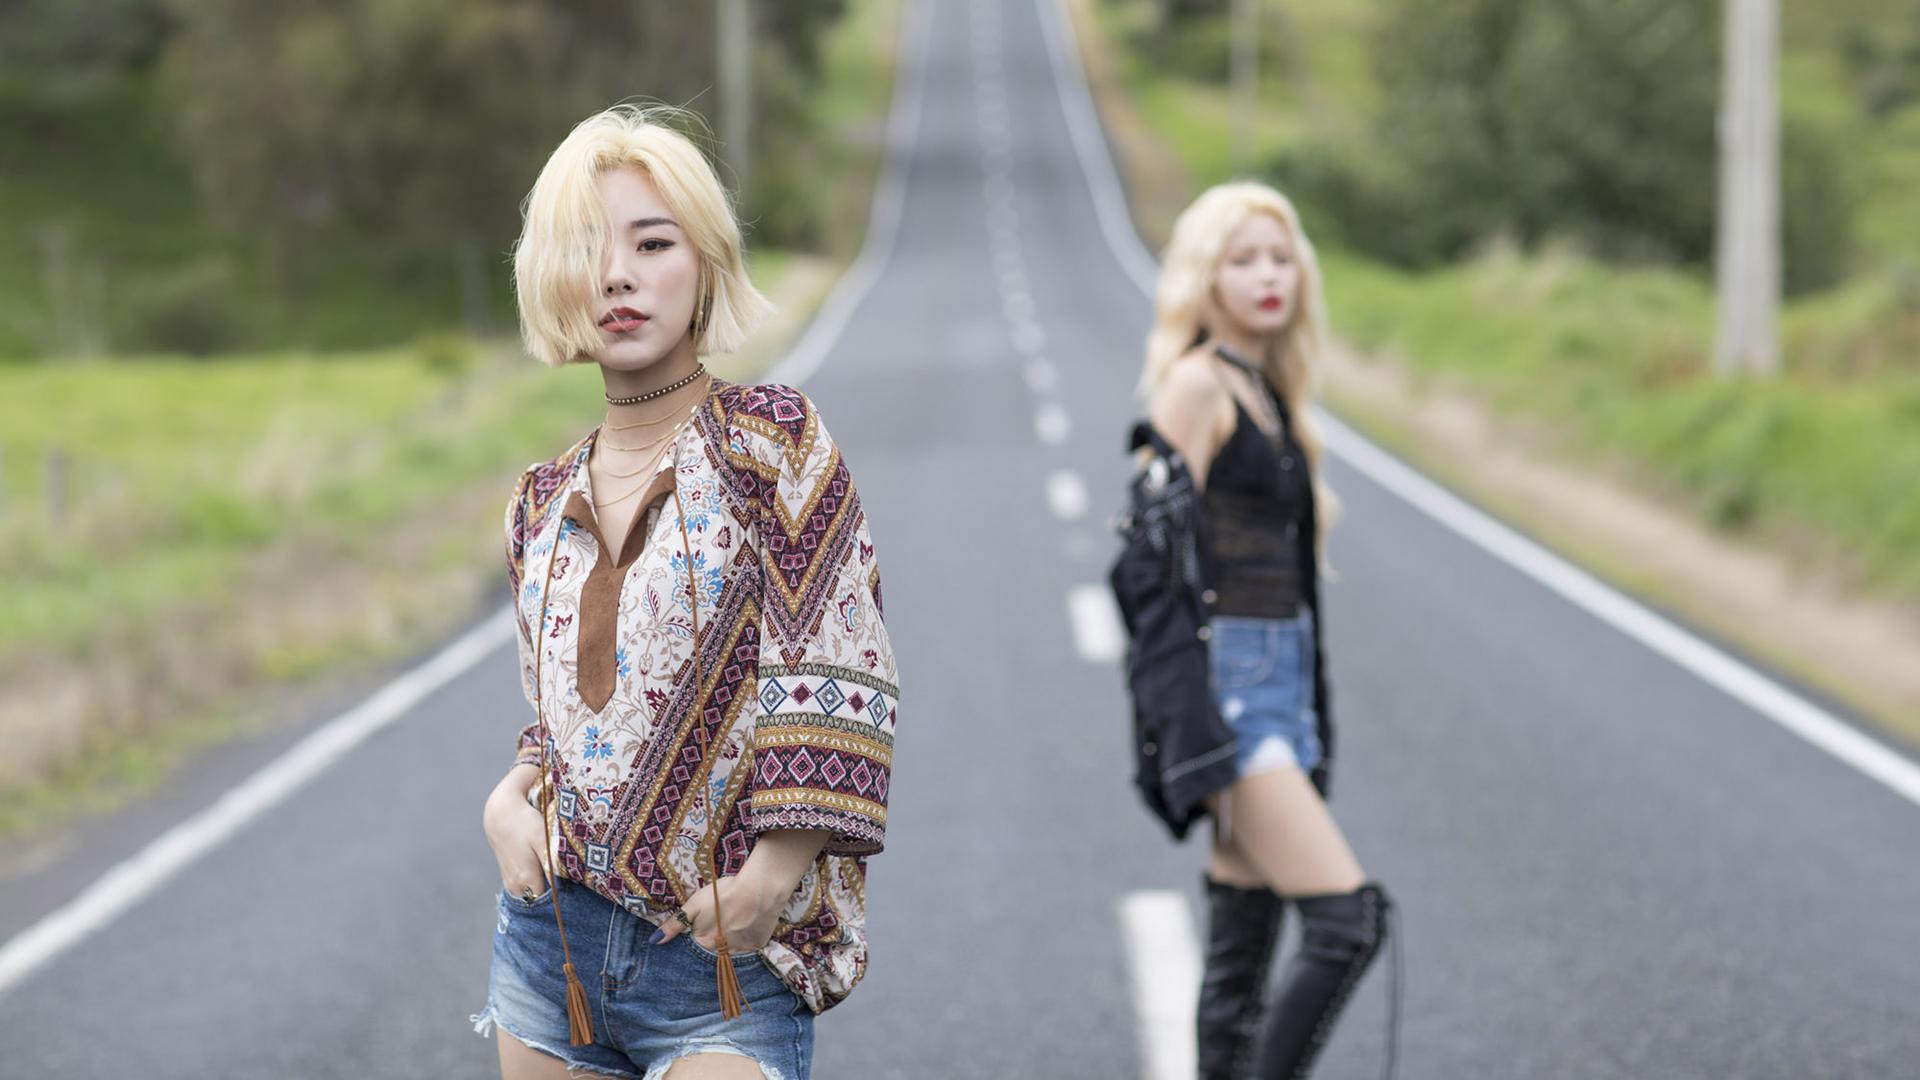 Asian Singer K Pop Mamamoo Band Korean Blonde Long Hair Brown Eyes Shorts Road Depth Of Field 1920x1080